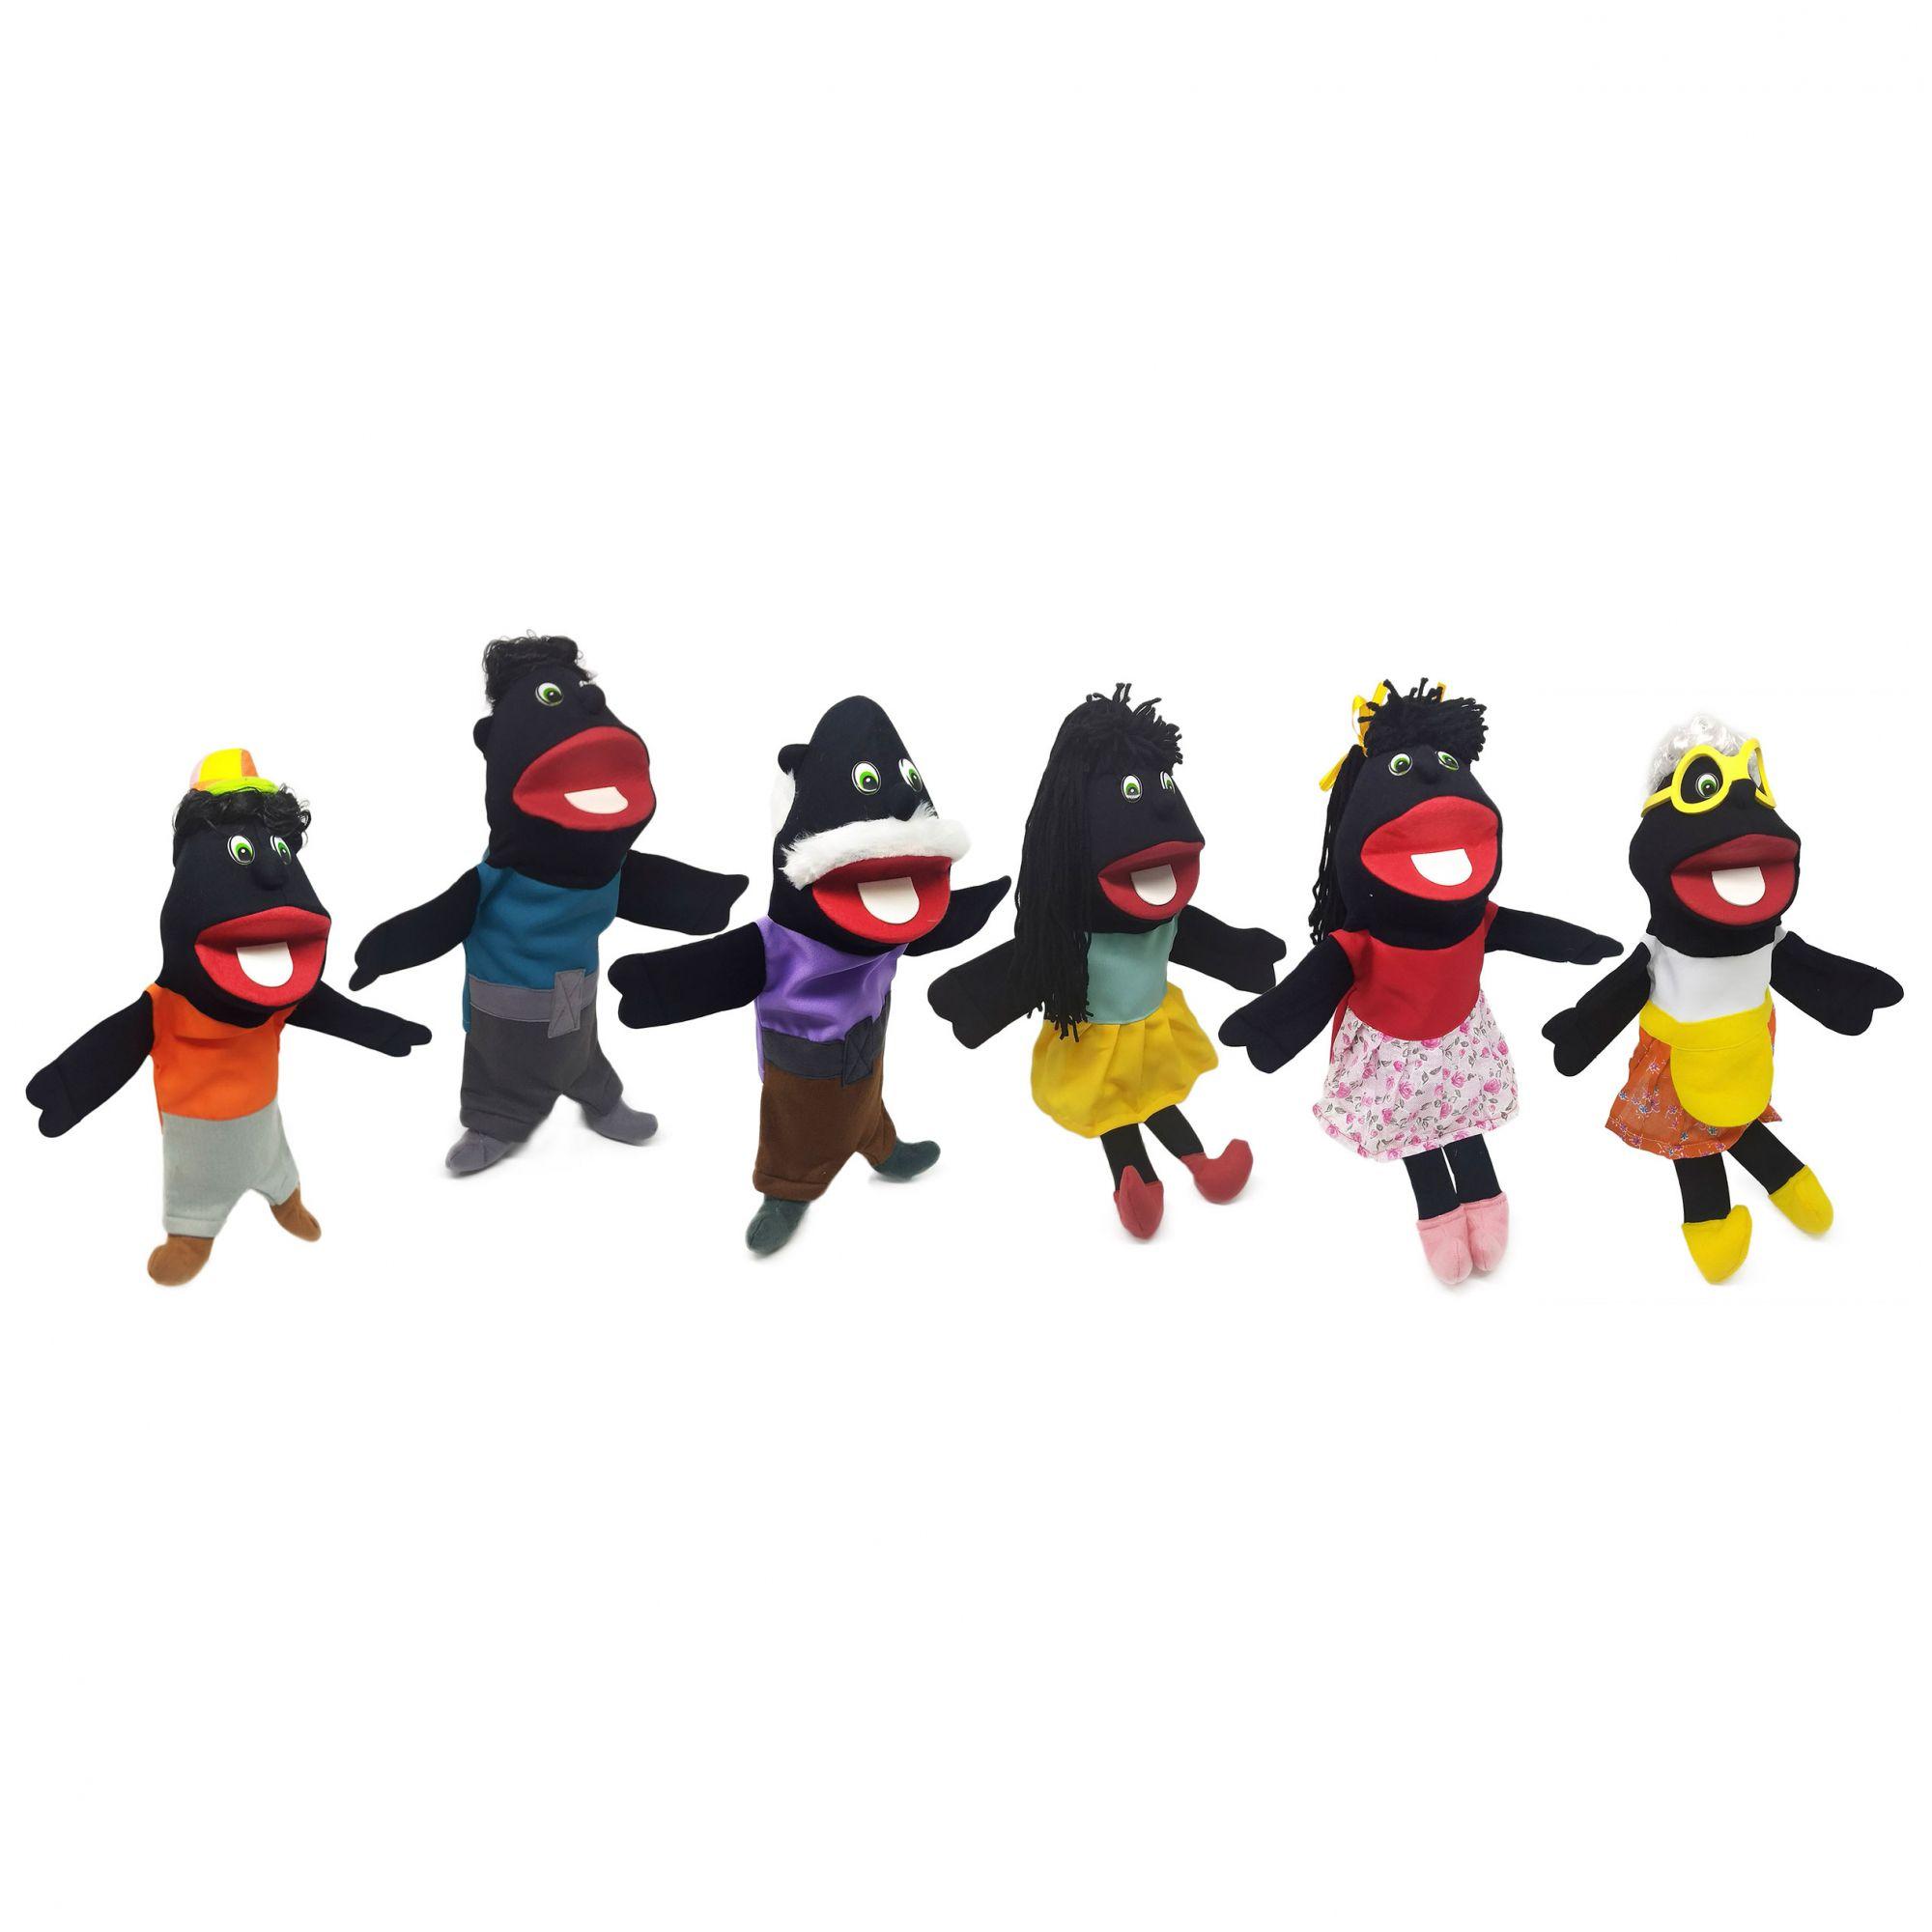 Kit Fantoche Família Negra 06 Personagens